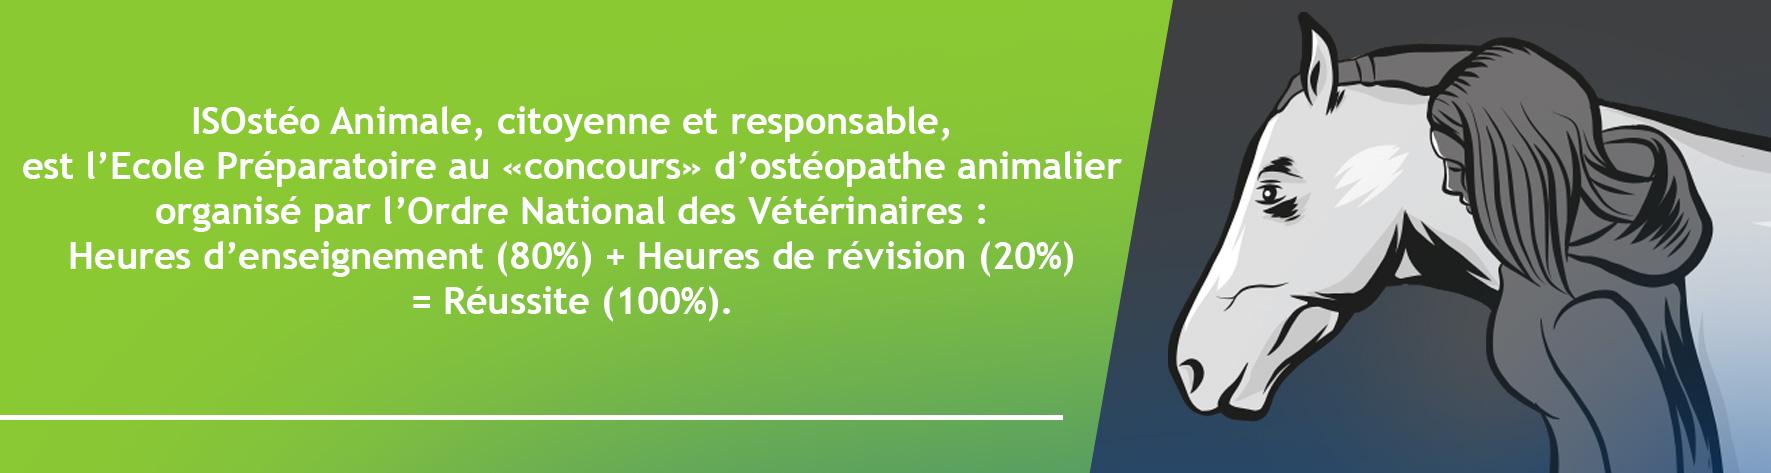 bandeau-animale-reussite-2020